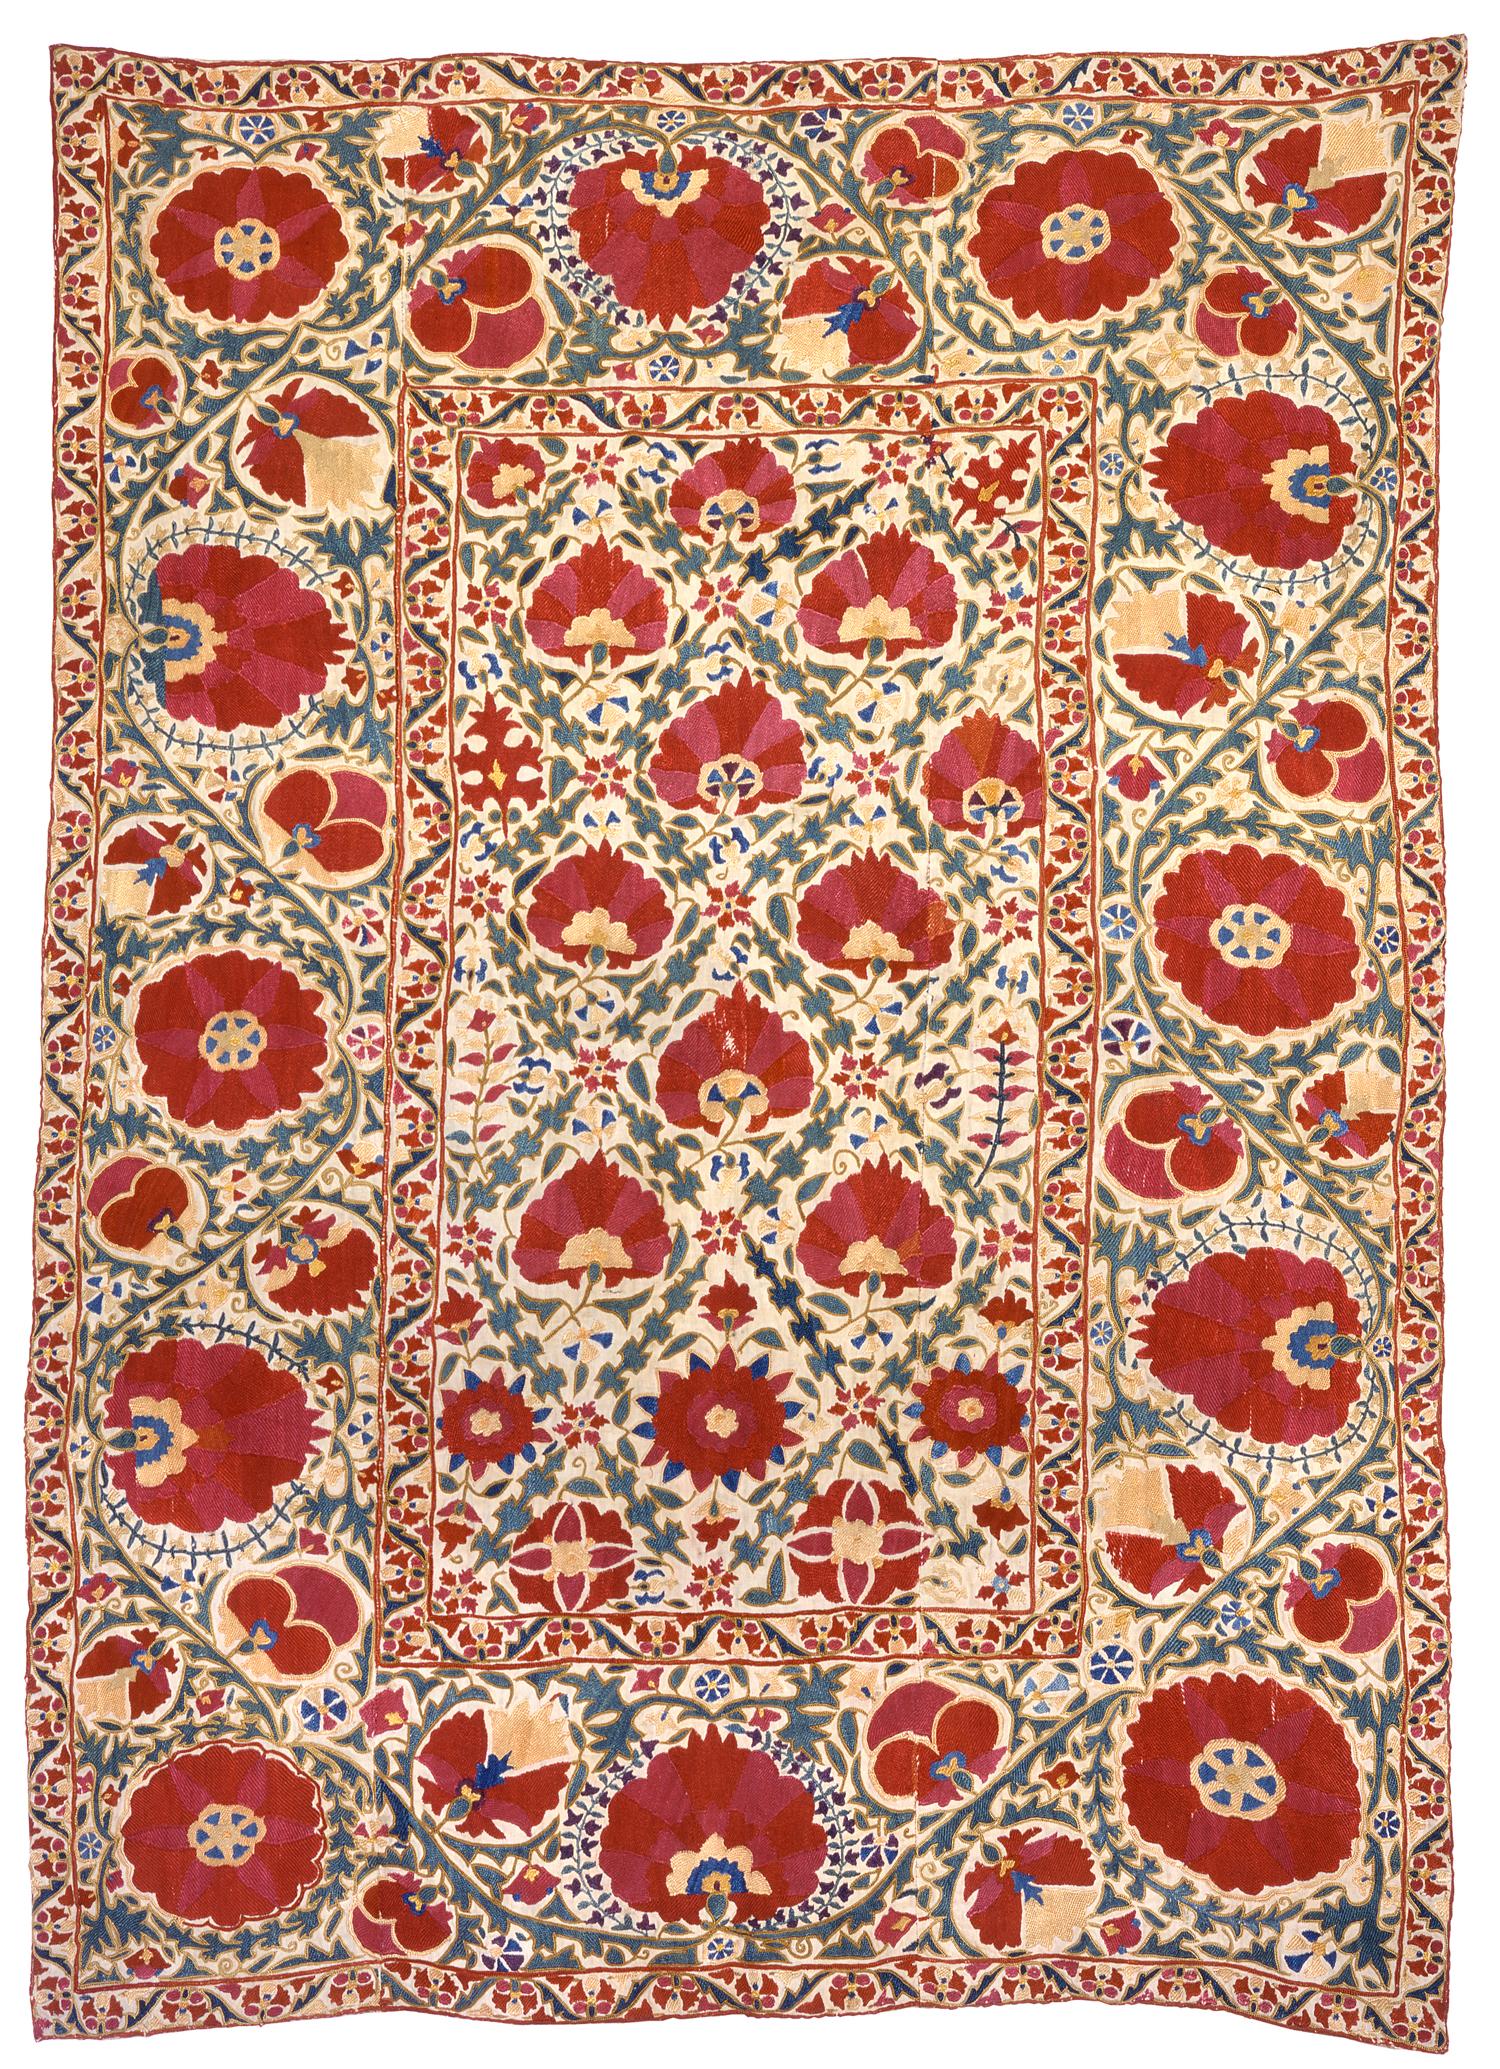 Bukhara suzani, Uzbekistan, 18th century. Esther Fitzgerald, London